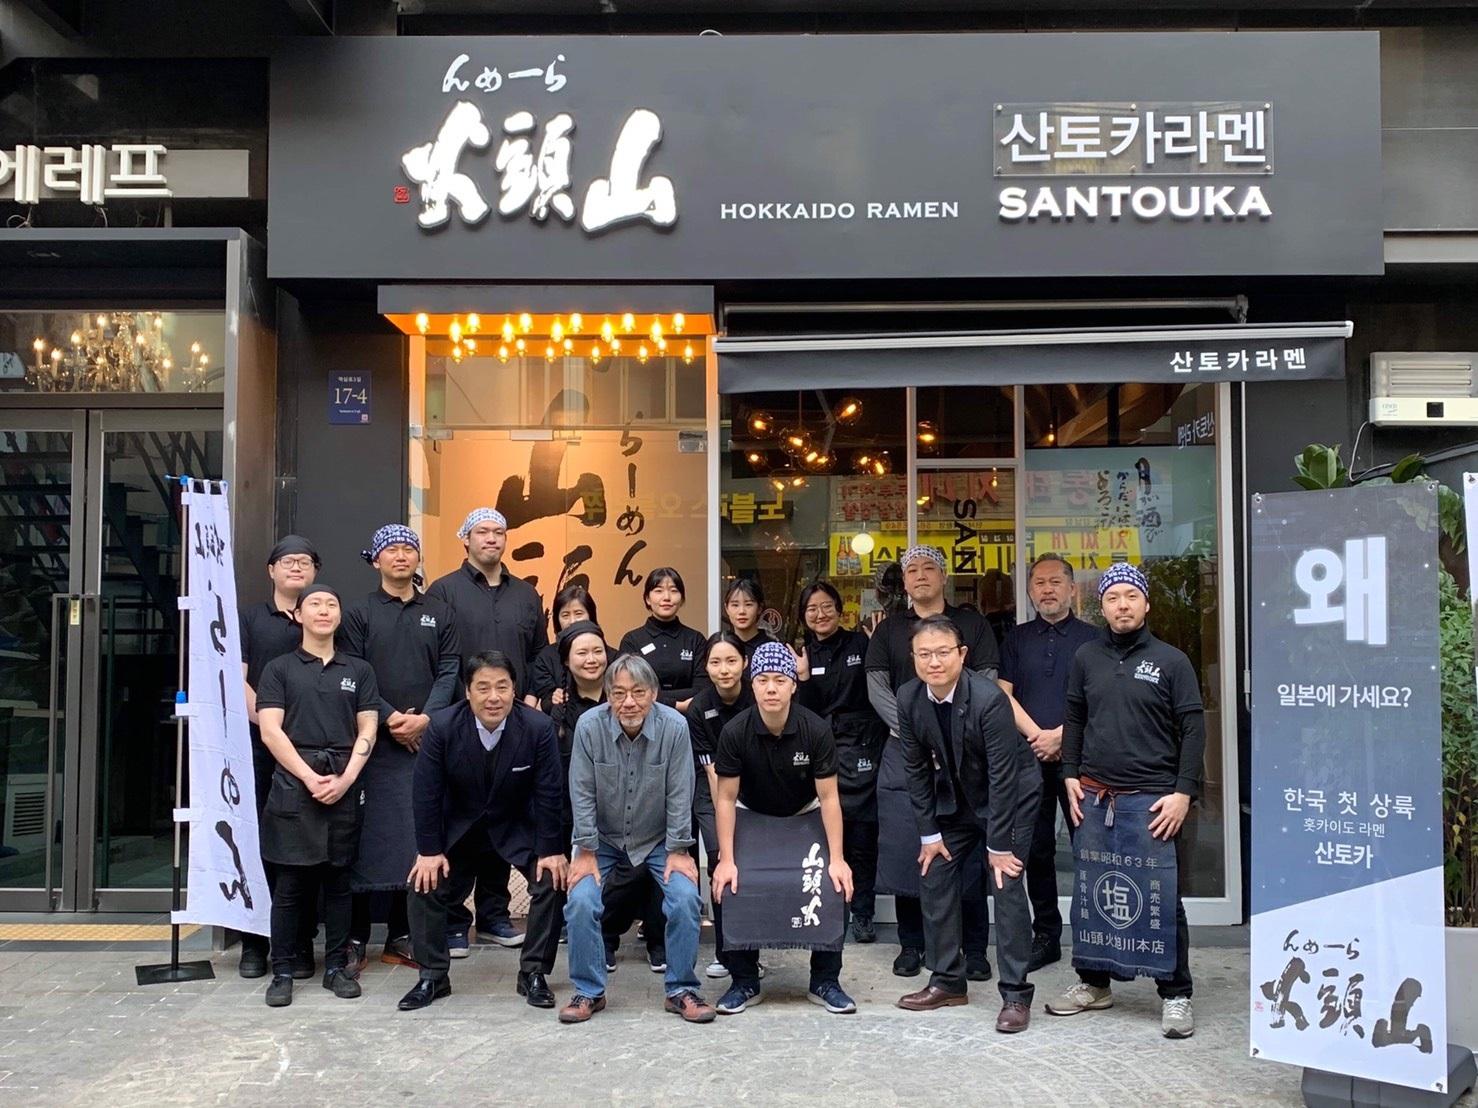 Santouka opened in Seoul!